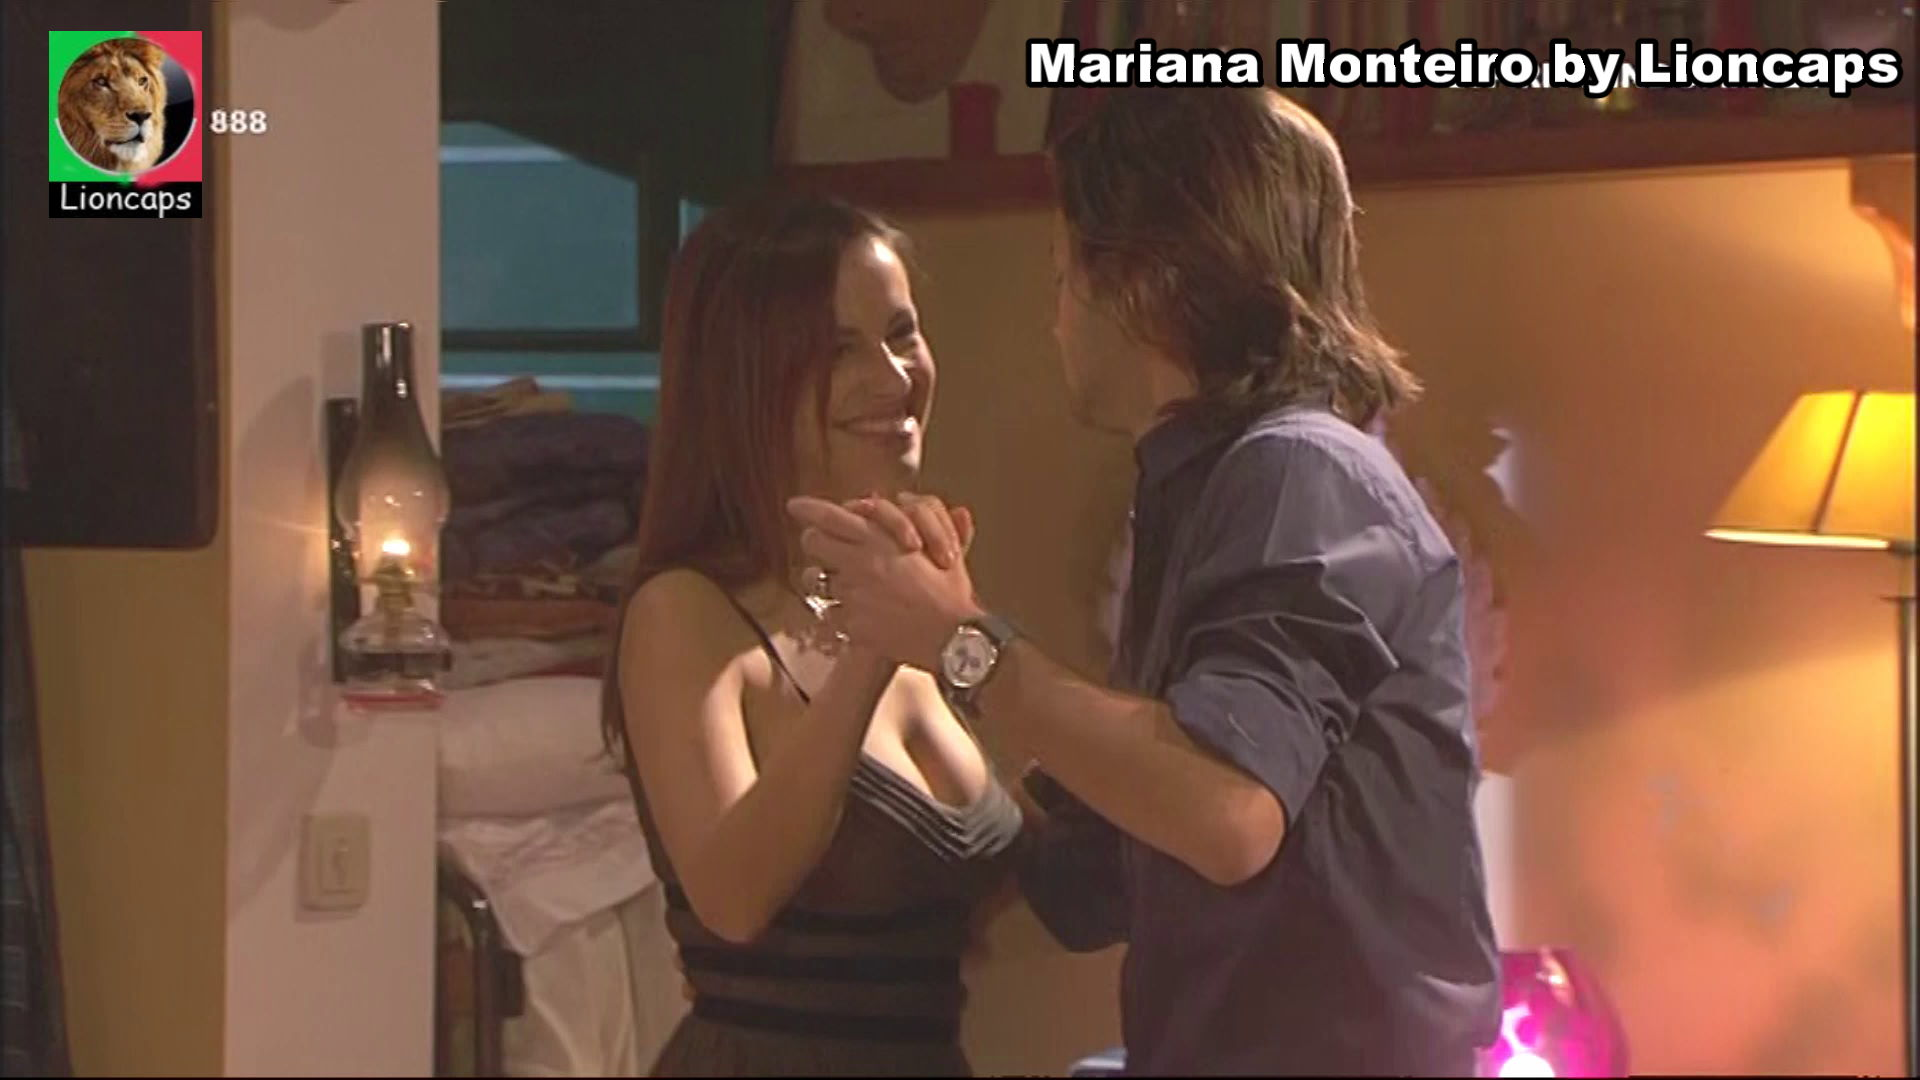 738388250_mariana_monteiro_vs190209_19218_122_454lo.JPG